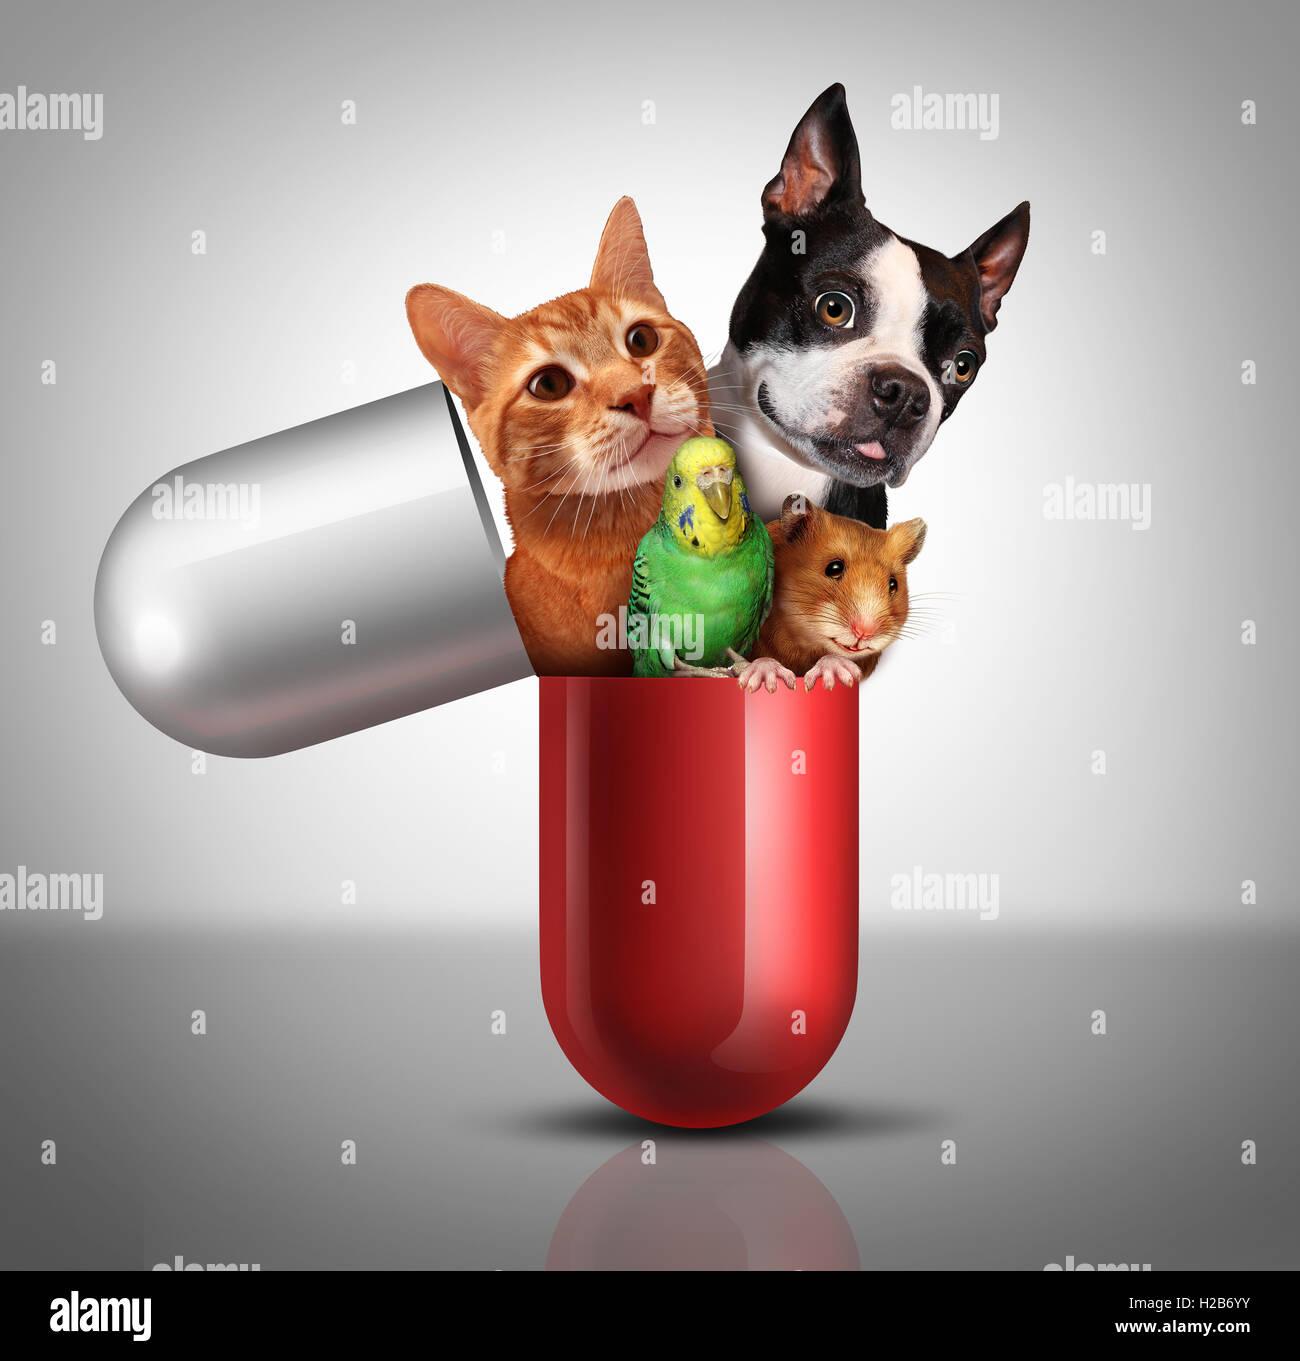 Dog And Cat Pharm